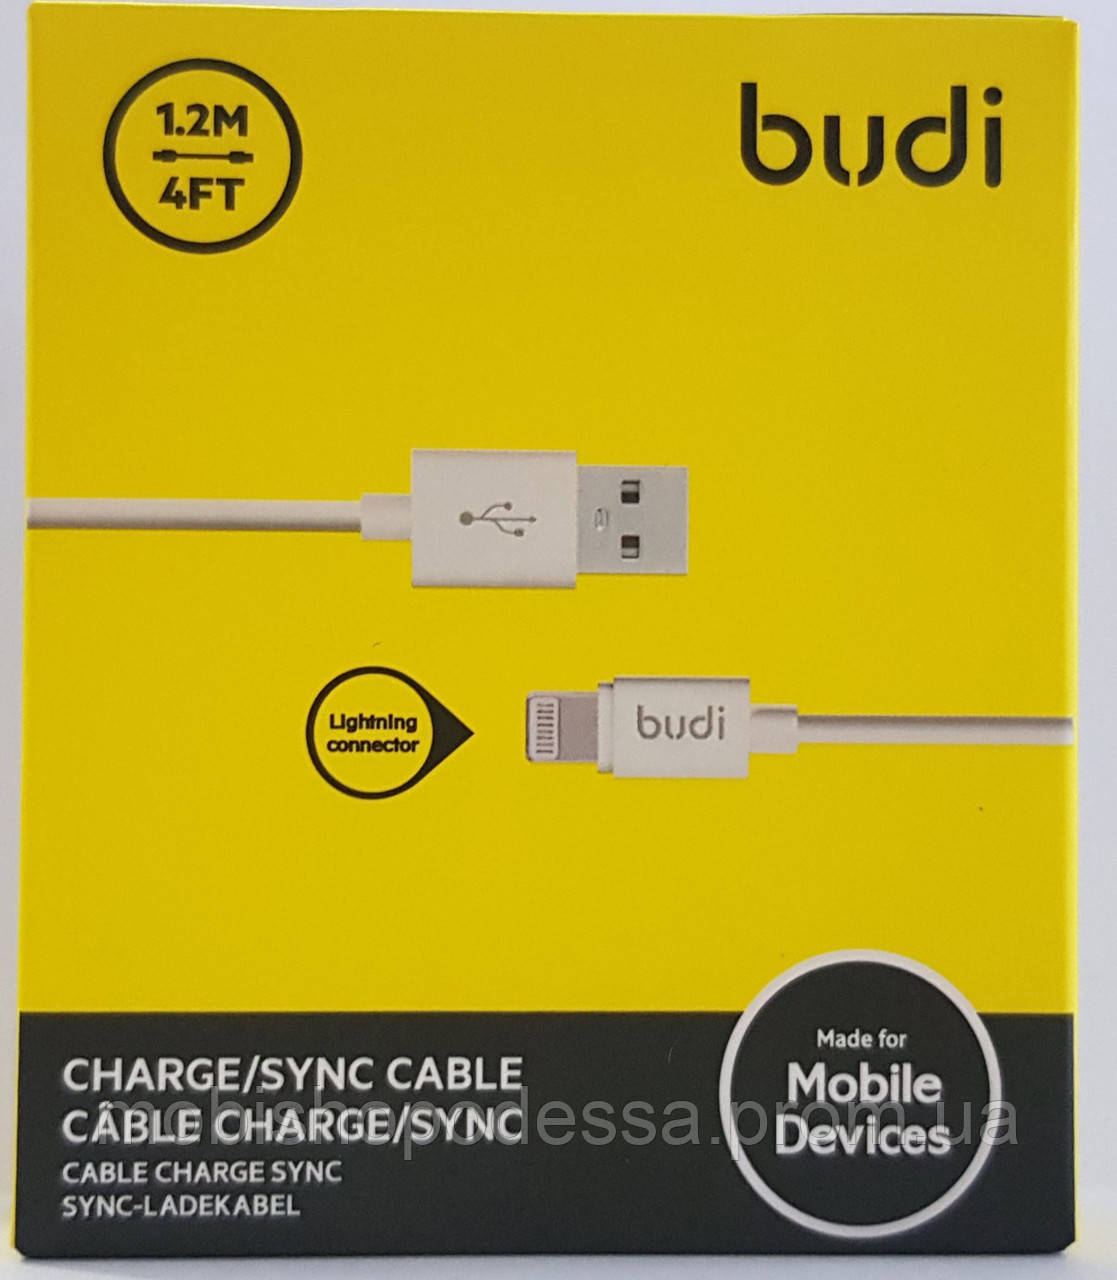 USB-кабель Budi Lightning  1,2м white M8J023-WTH